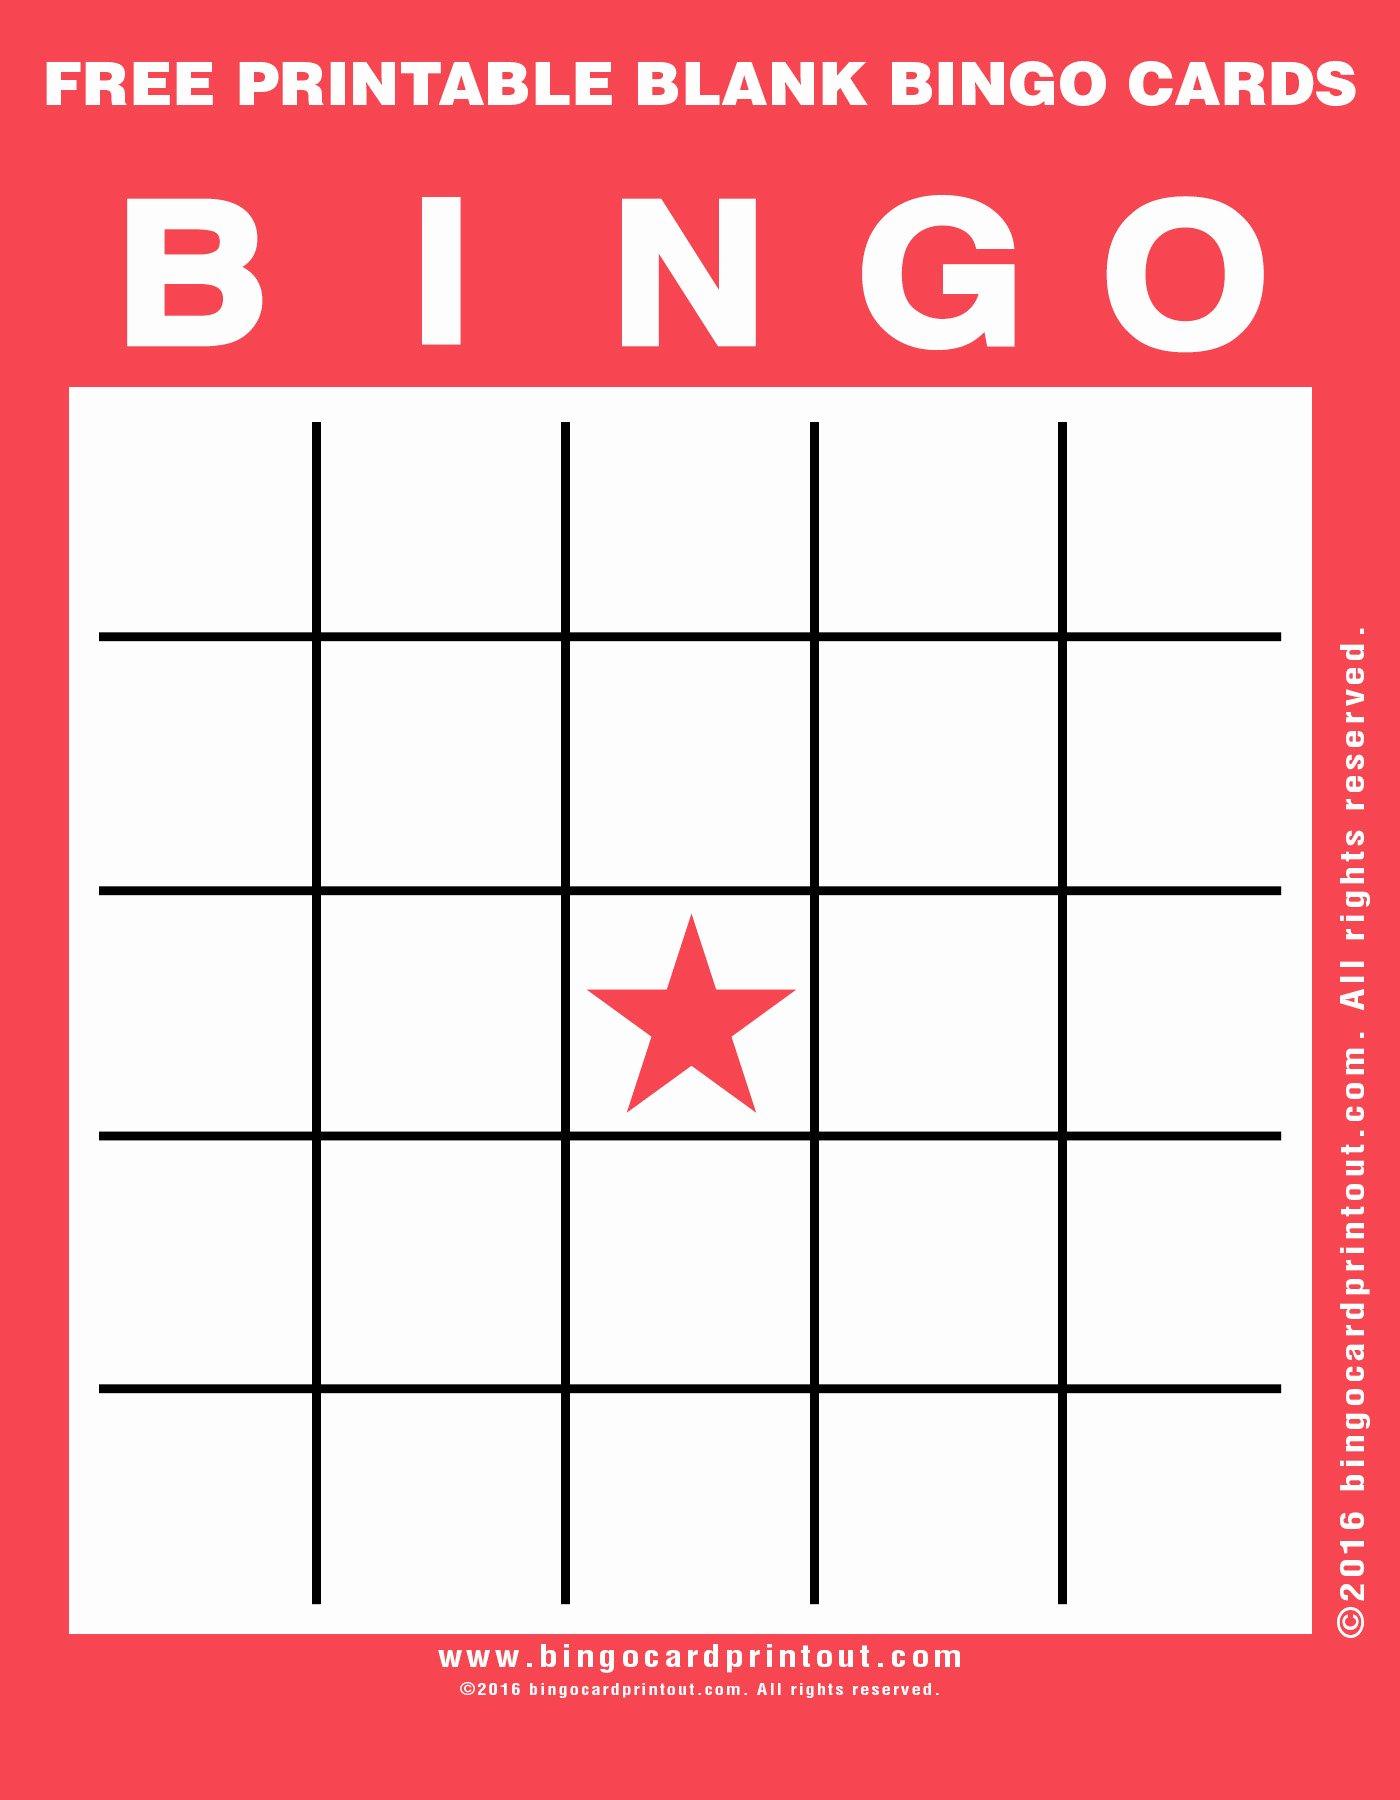 Blank Printable Bingo Cards Elegant Free Printable Blank Bingo Cards Bingocardprintout